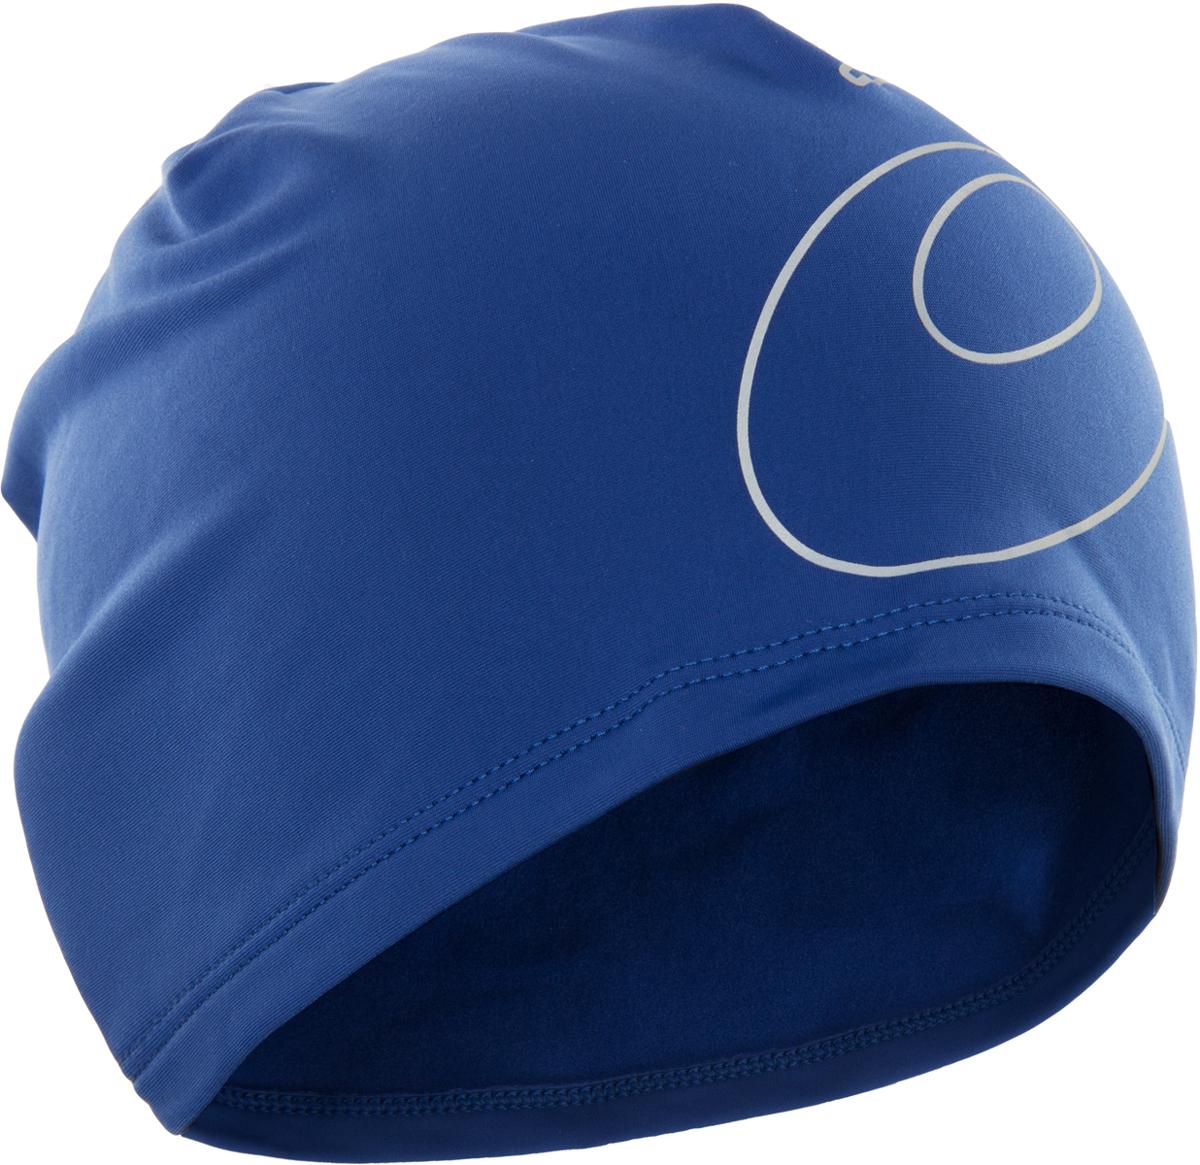 Шапка Asics Logo Beanie, цвет: синий. 135519-0844. Размер 56/58135519-0844Демисезонная шапка для бега